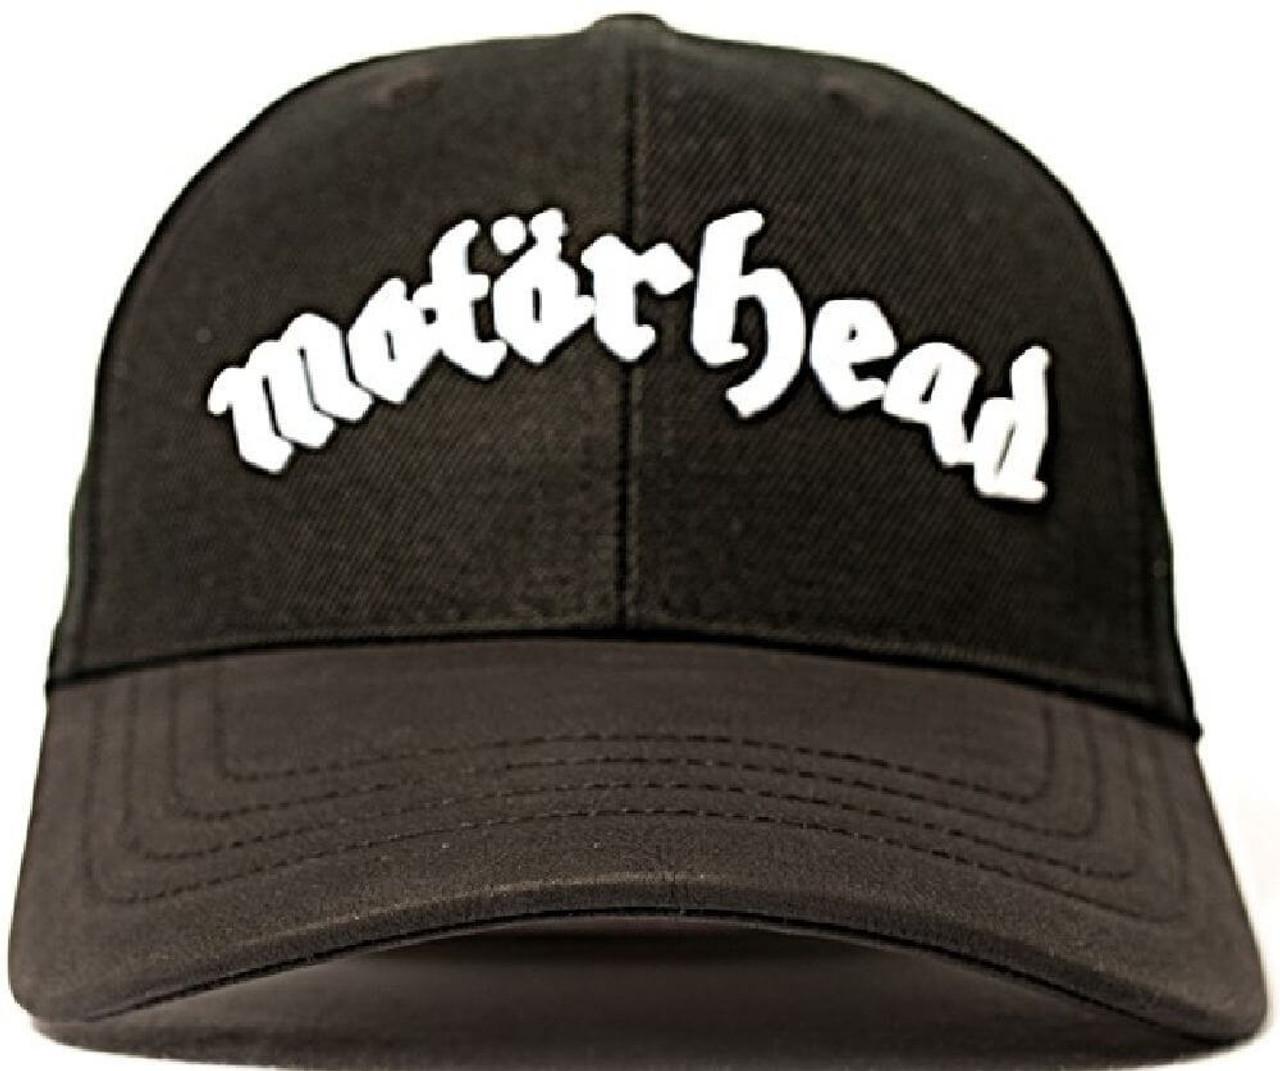 9387c1c85 Motorhead Baseball Hat - Motorhead Logo | Black Wool-Blend and Leather Cap